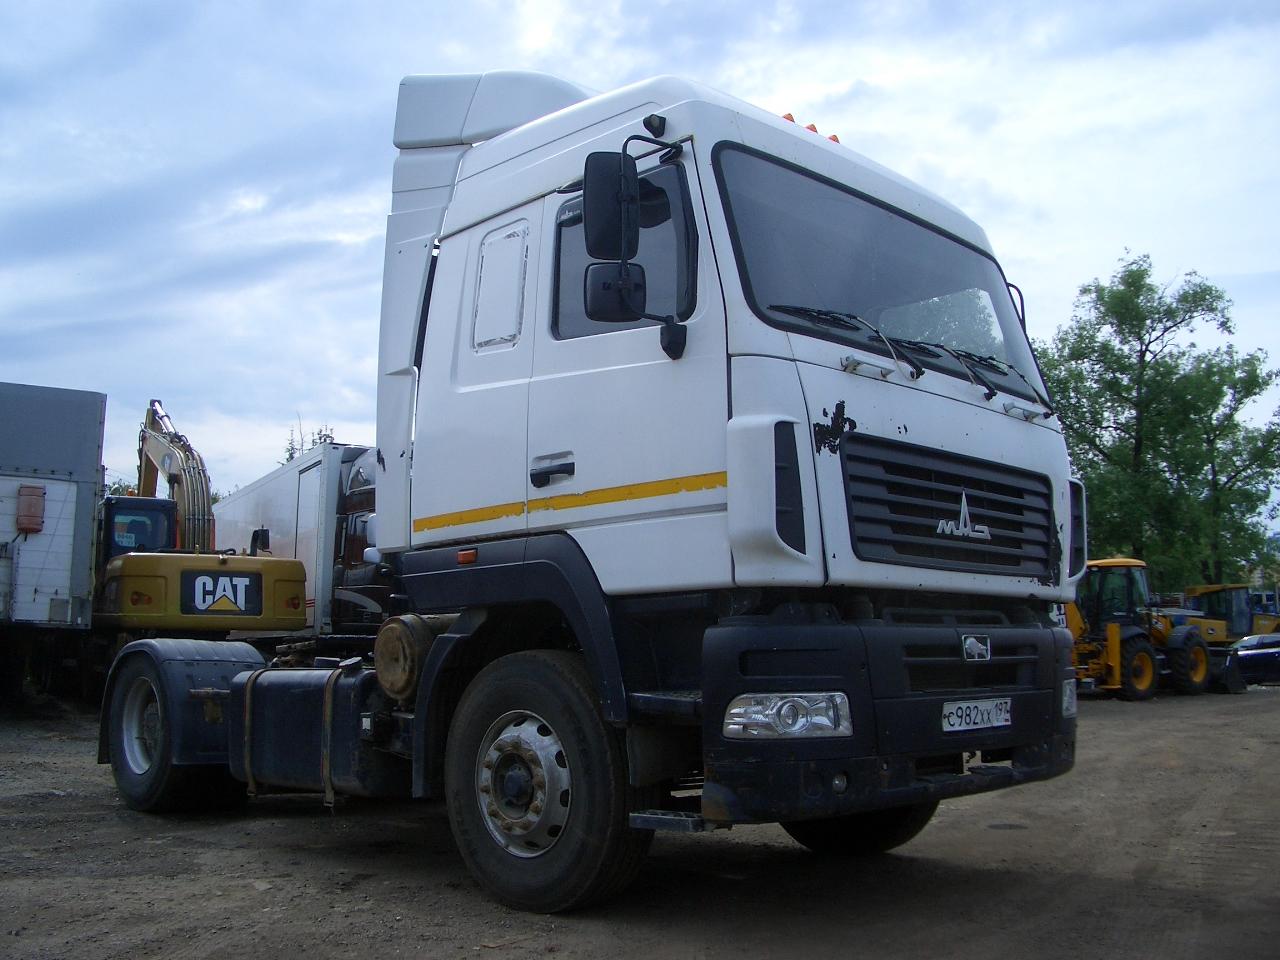 Автомобиль МАЗ-5440